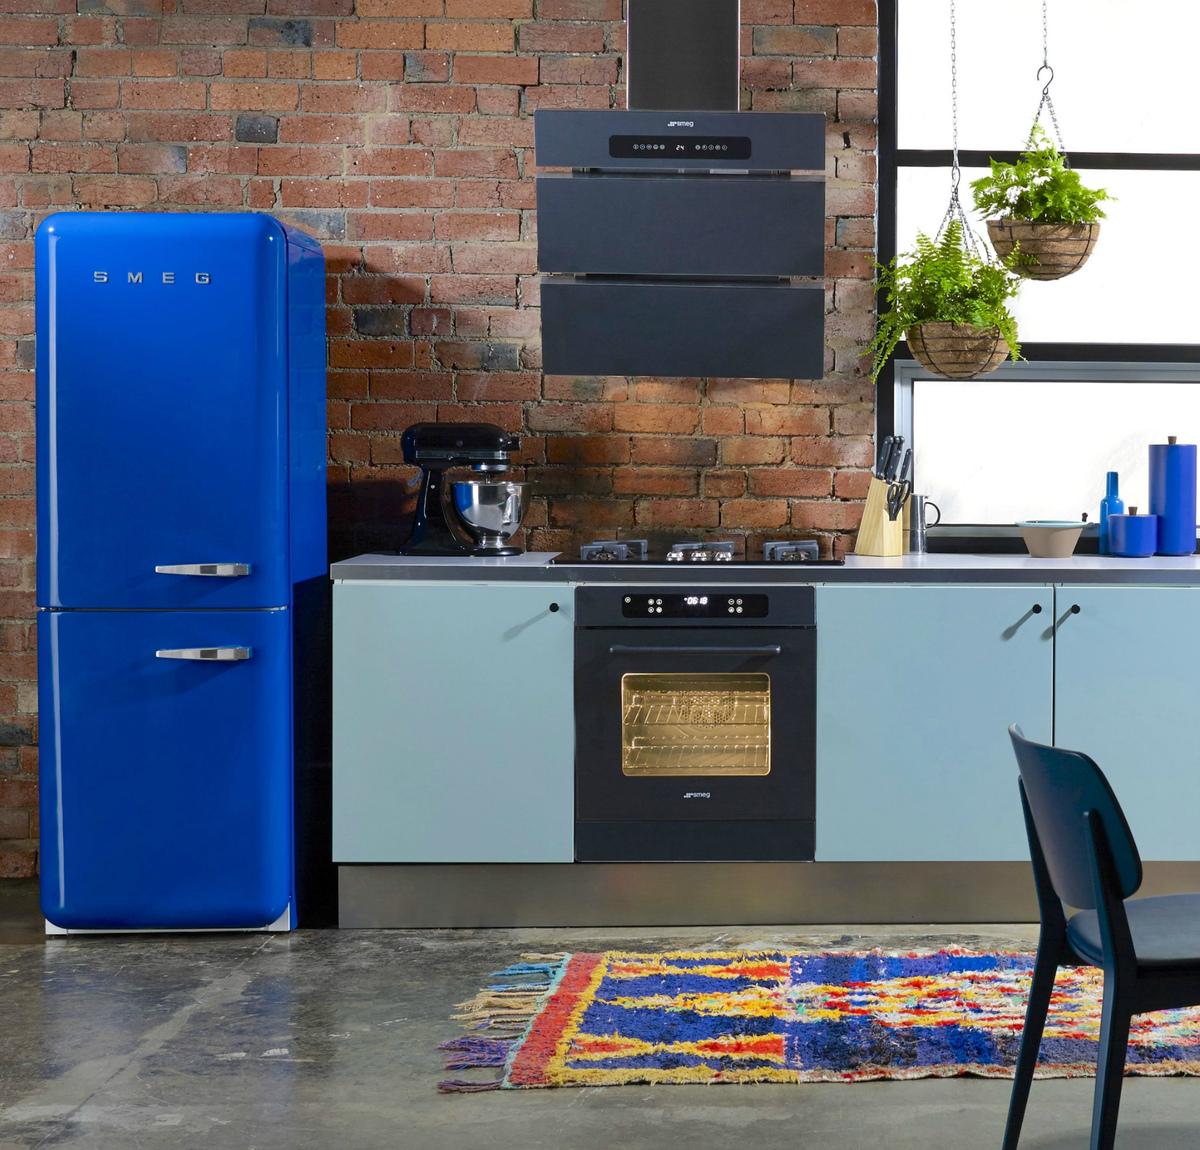 retro kitchen appliances cool kitchen gadgets and